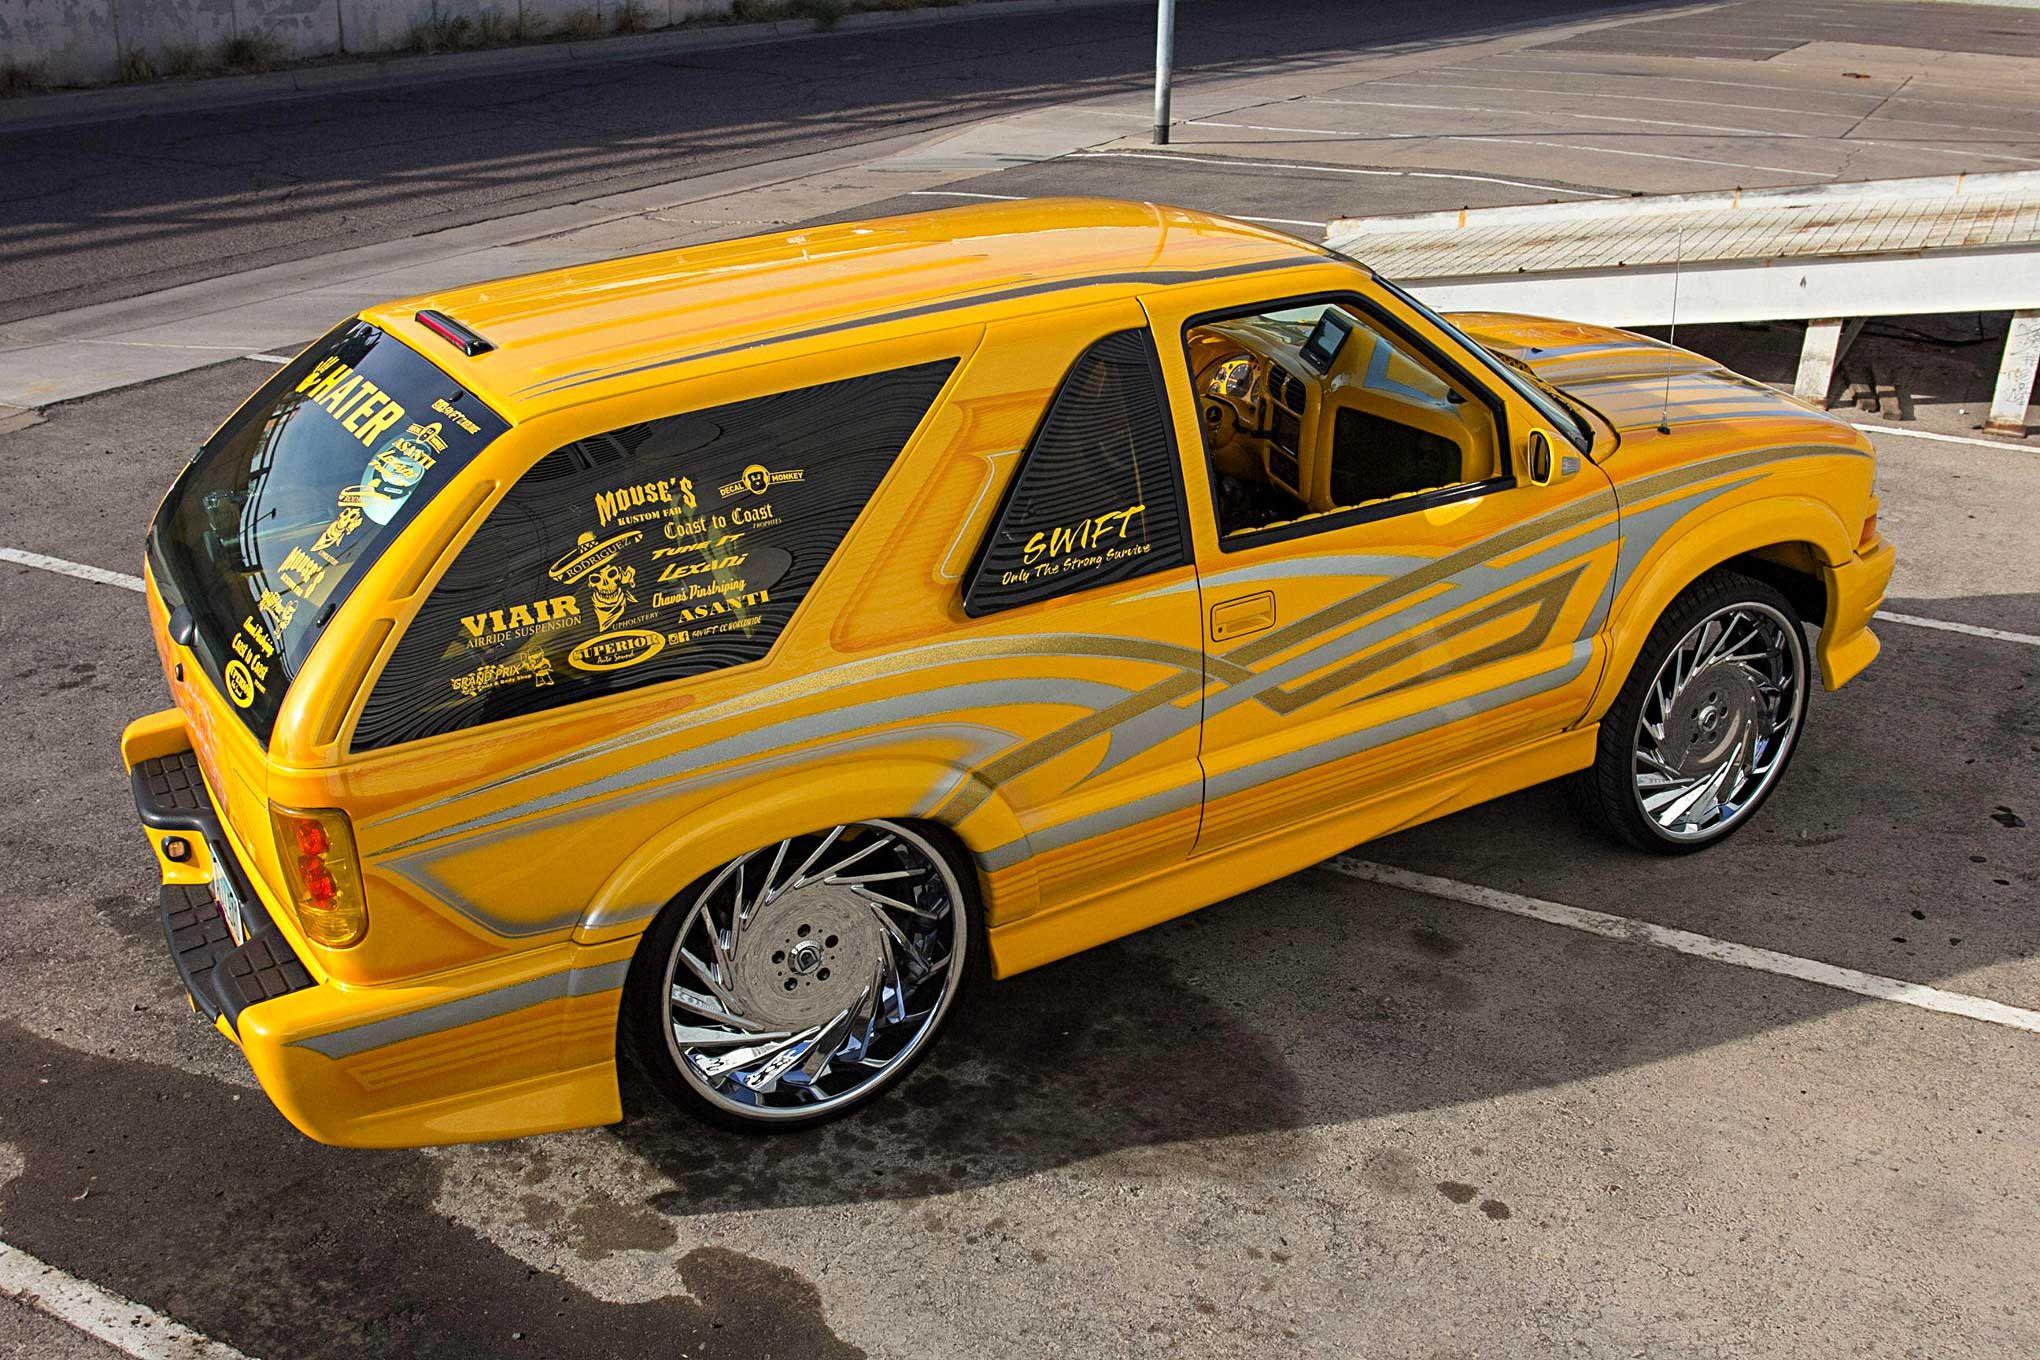 2003 chevy blazer xtreme an extreme build [ 2040 x 1360 Pixel ]